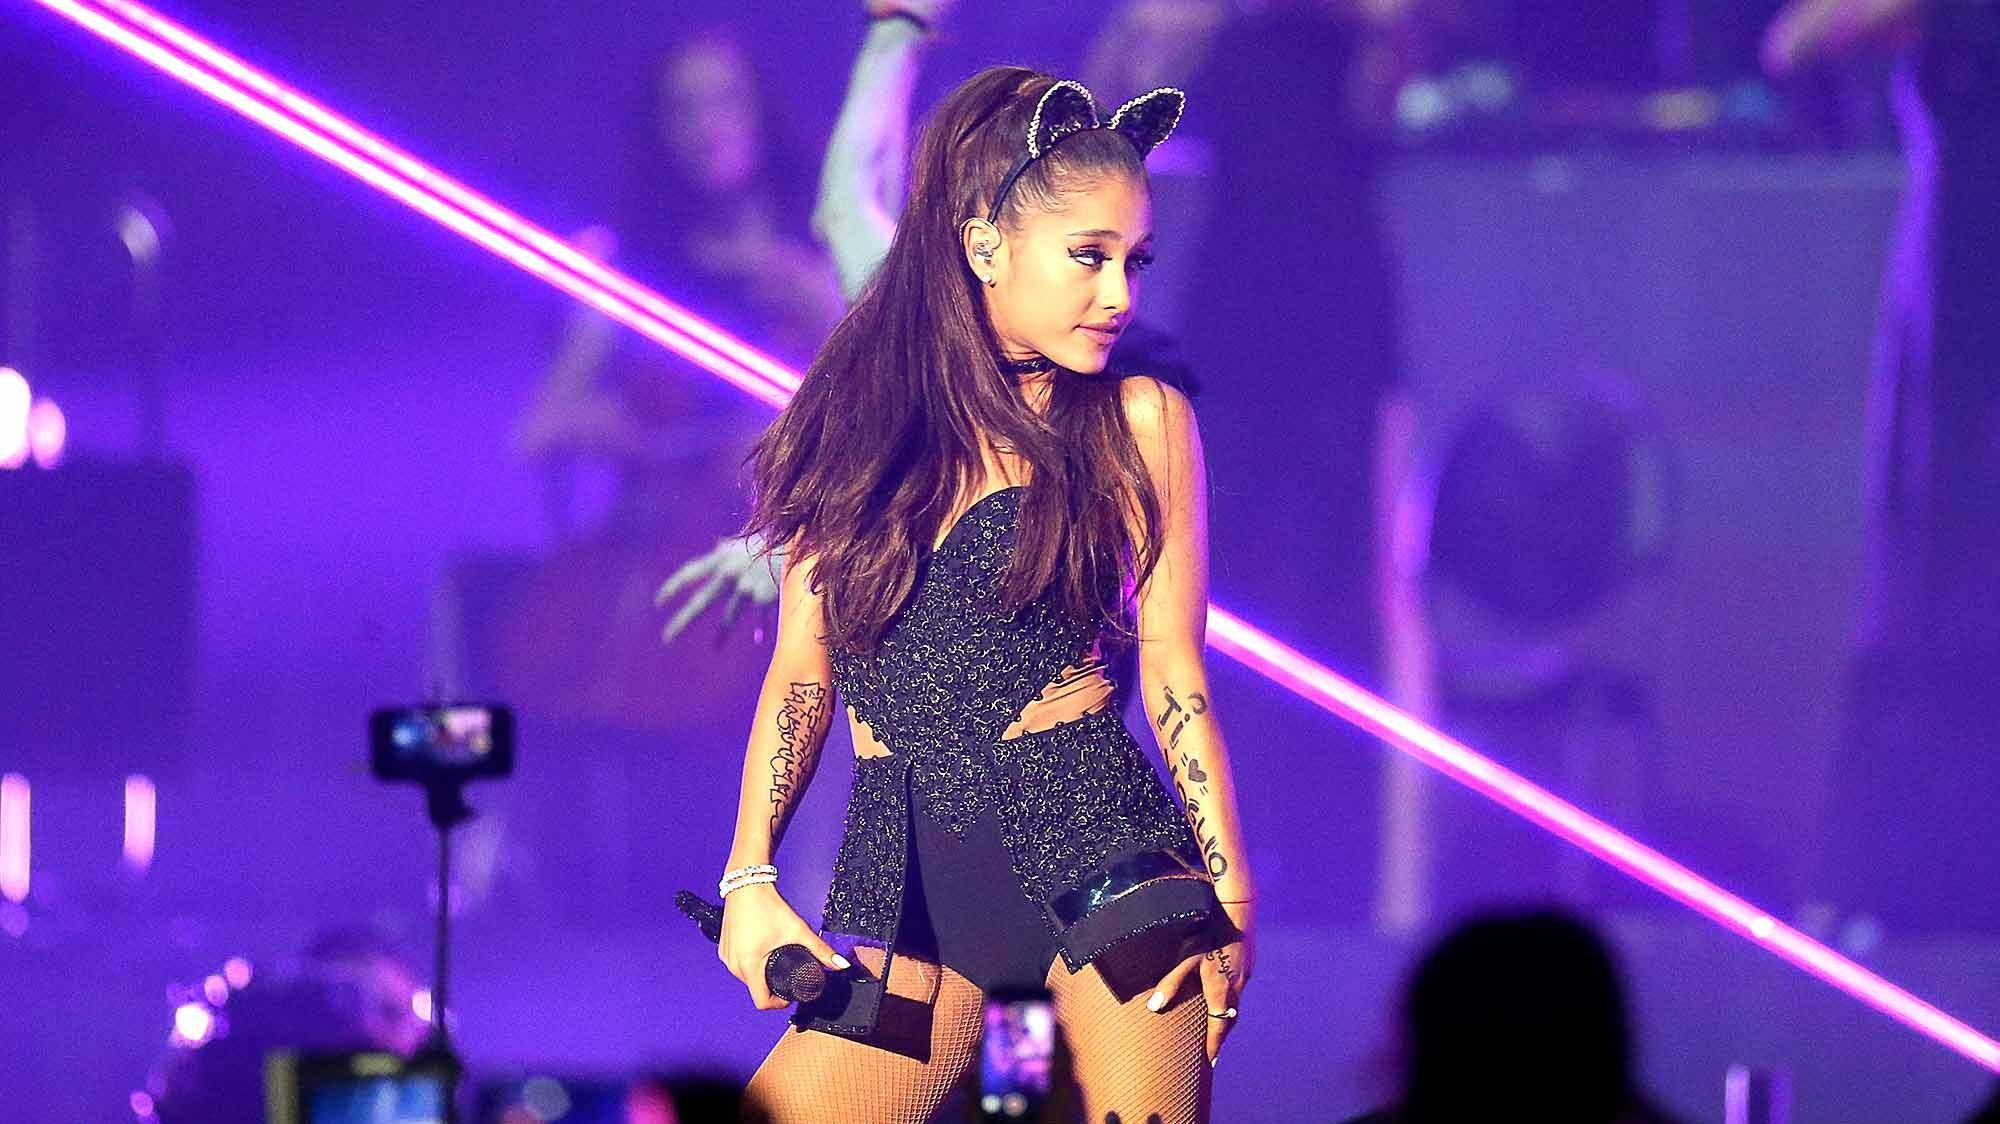 Ariana Grande performs at Mediolanum Forum on May 25, 2015 in Milan, Italy.